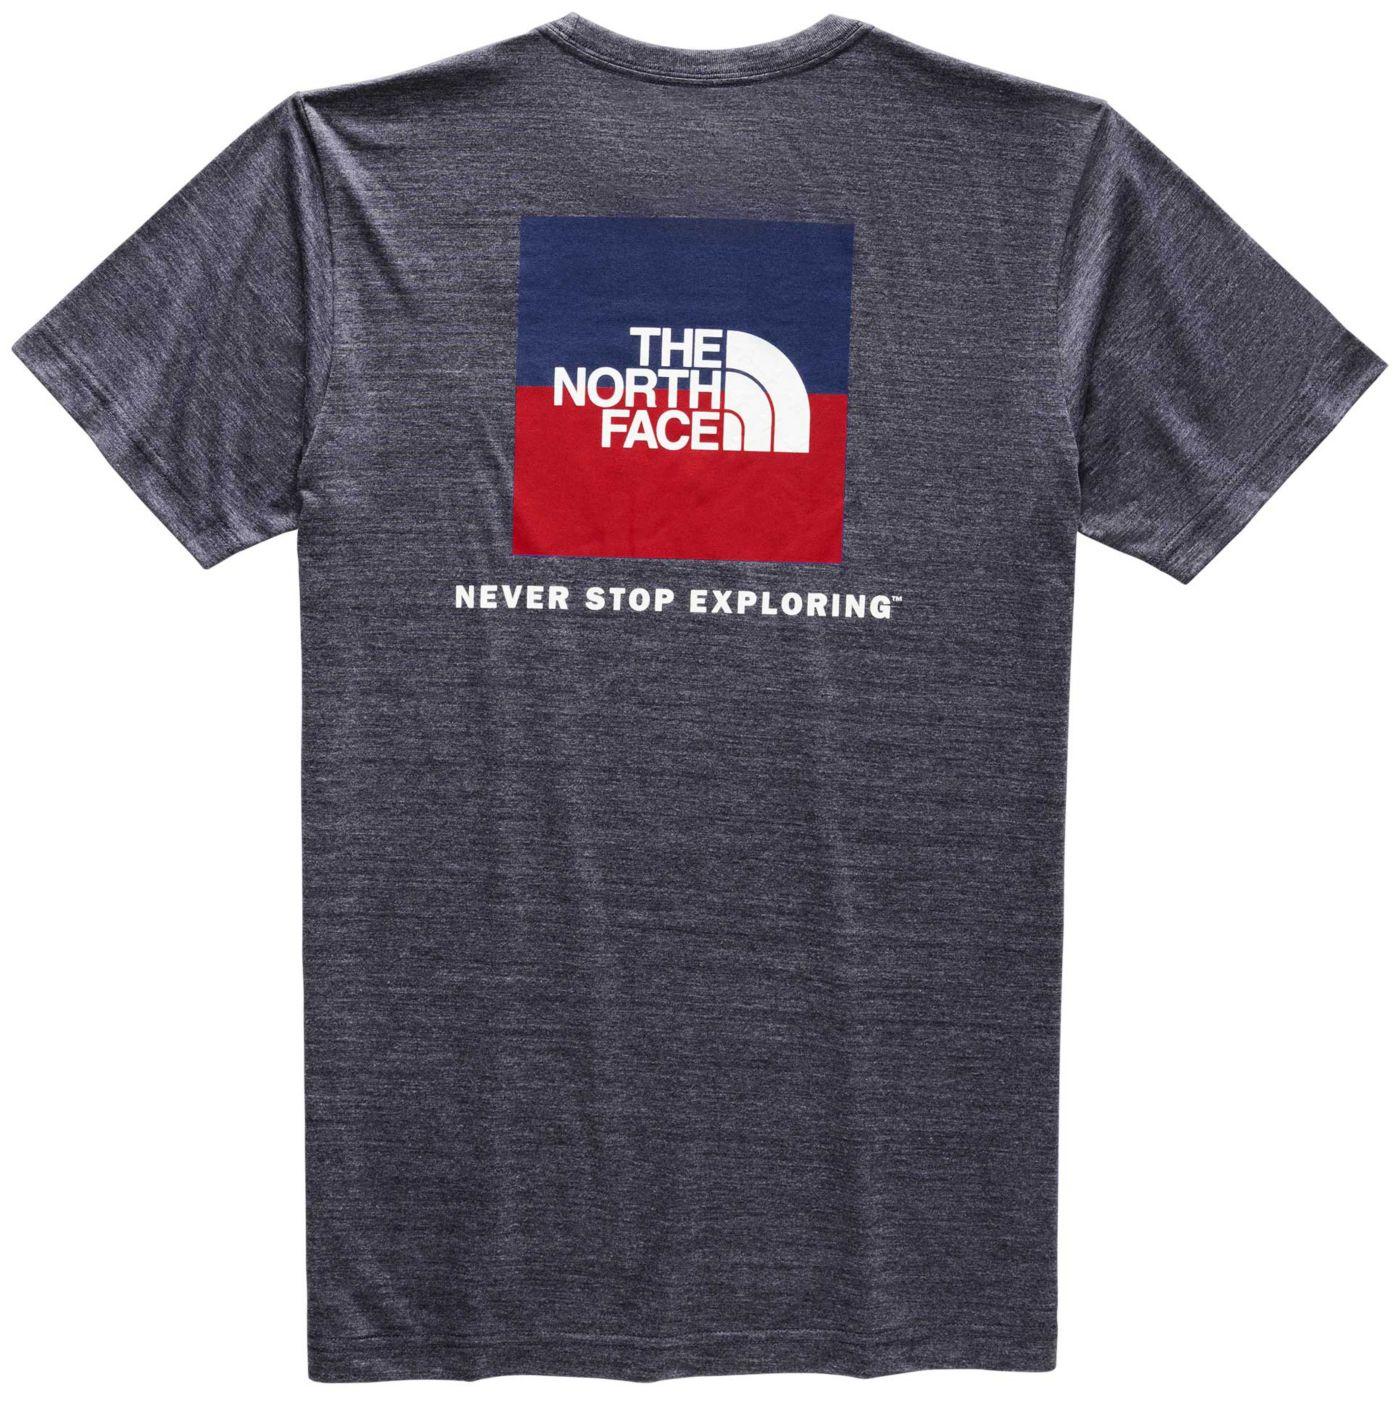 The North Face Men's Americana Short Sleeve T-Shirt